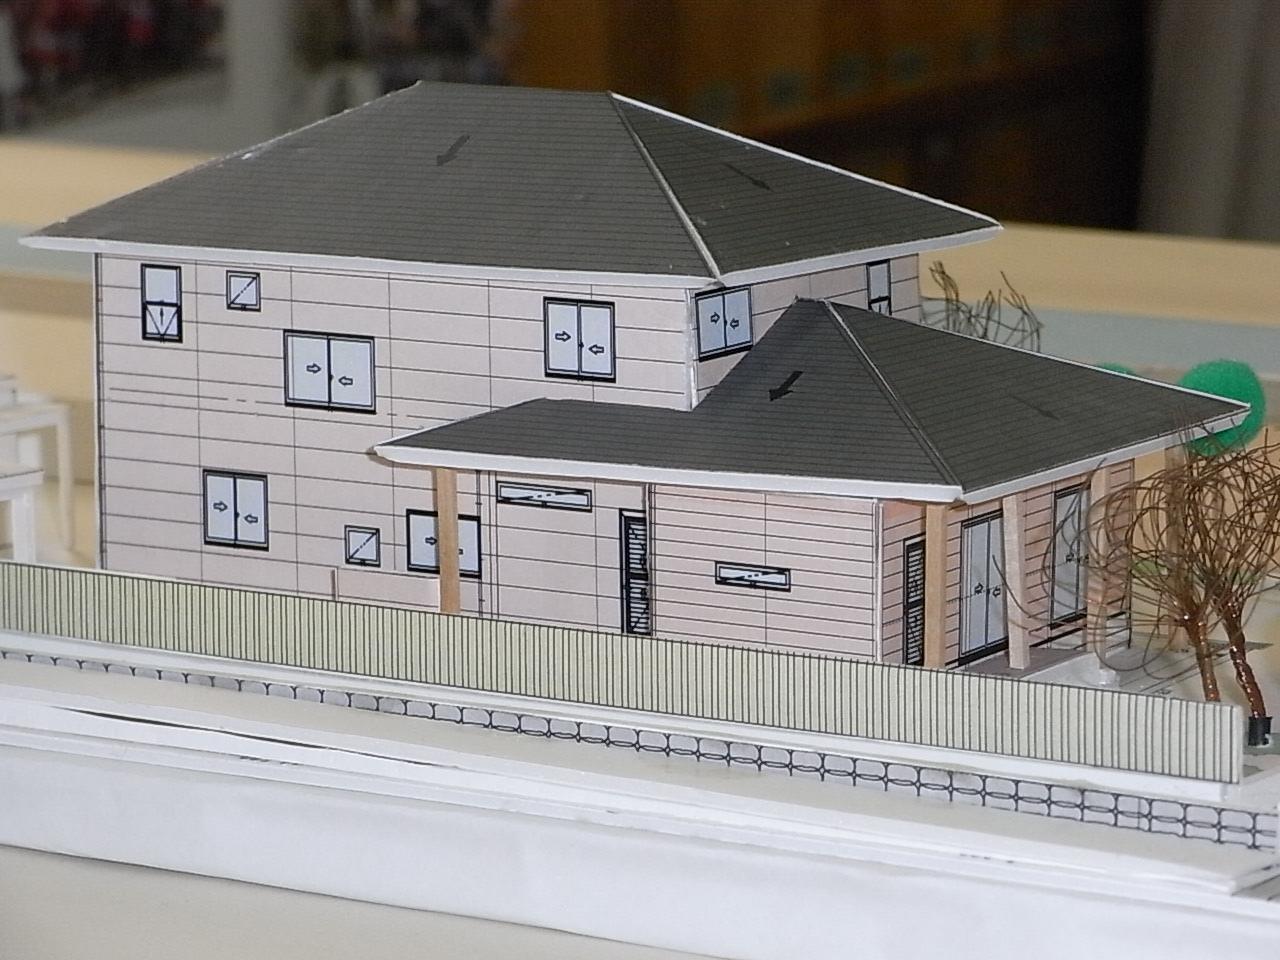 m-house模型_c0194417_11533615.jpg